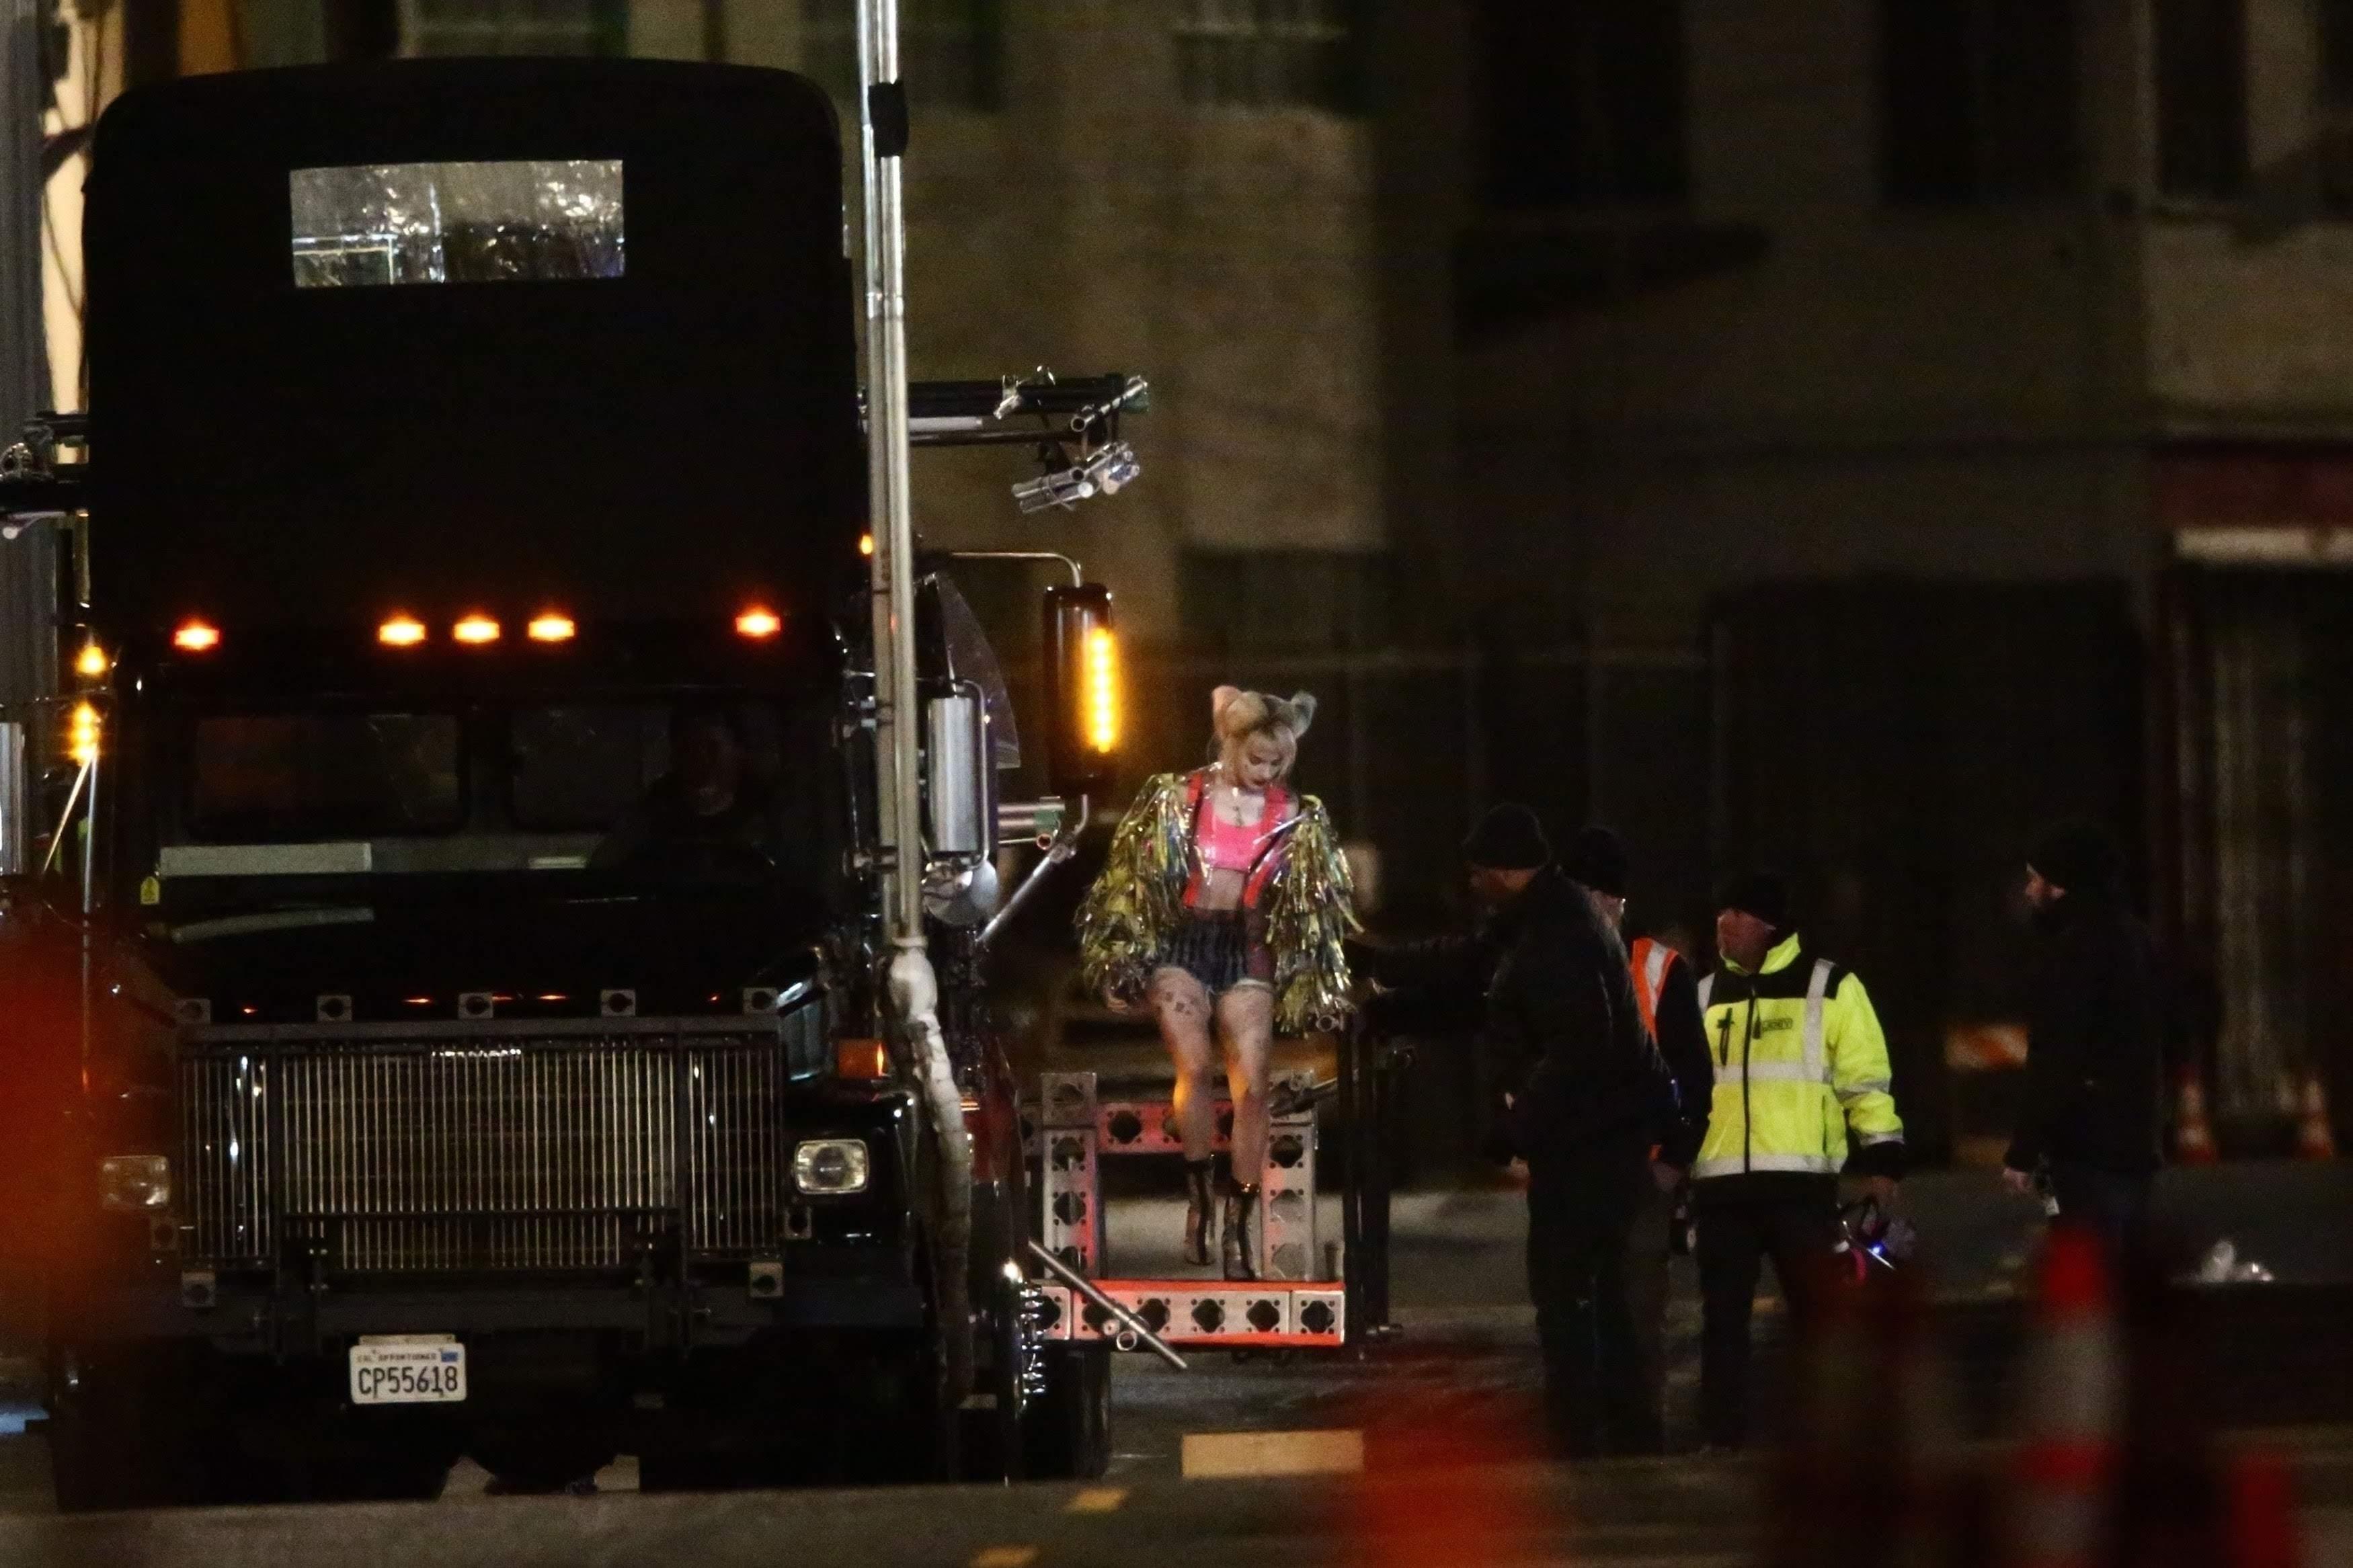 Margot Robbie as Harley Quinn watches a truck explosion in Birds of Prey : 中華料理屋の次はトラックも爆発するらしい DCコミックスの戦うヒロイン映画「バーズ・オブ・プレイ」を撮影中のハーレー・クインのマーゴット・ロビー ! !